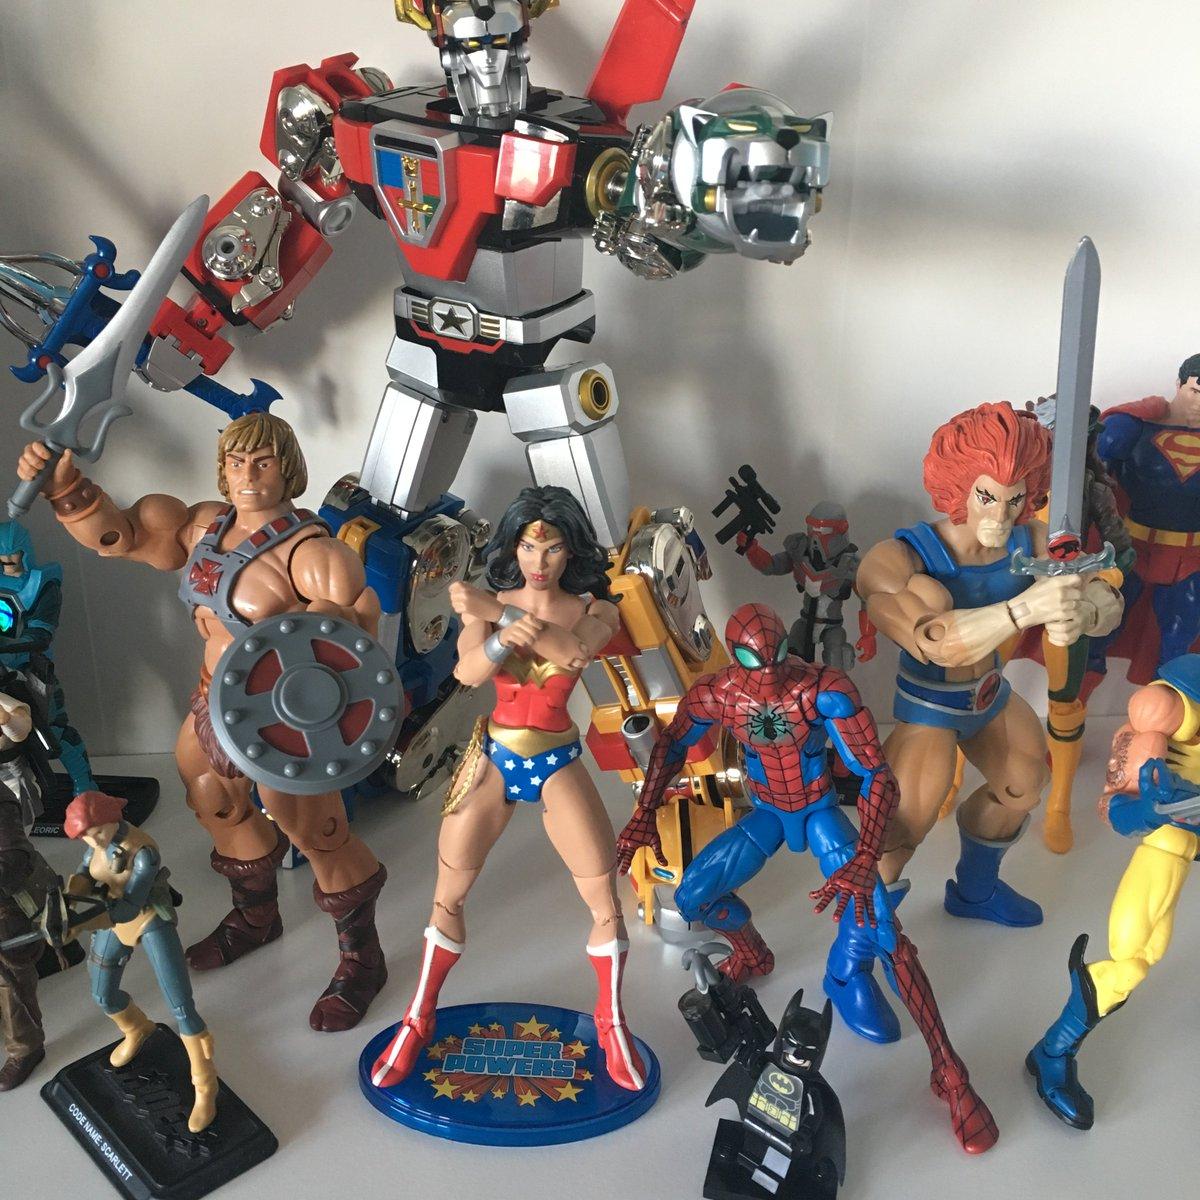 80 Toy Action Figure Shelves - DP1K9PcWkAAhhW5_Fantastic 80 Toy Action Figure Shelves - DP1K9PcWkAAhhW5  Graphic_24653.jpg